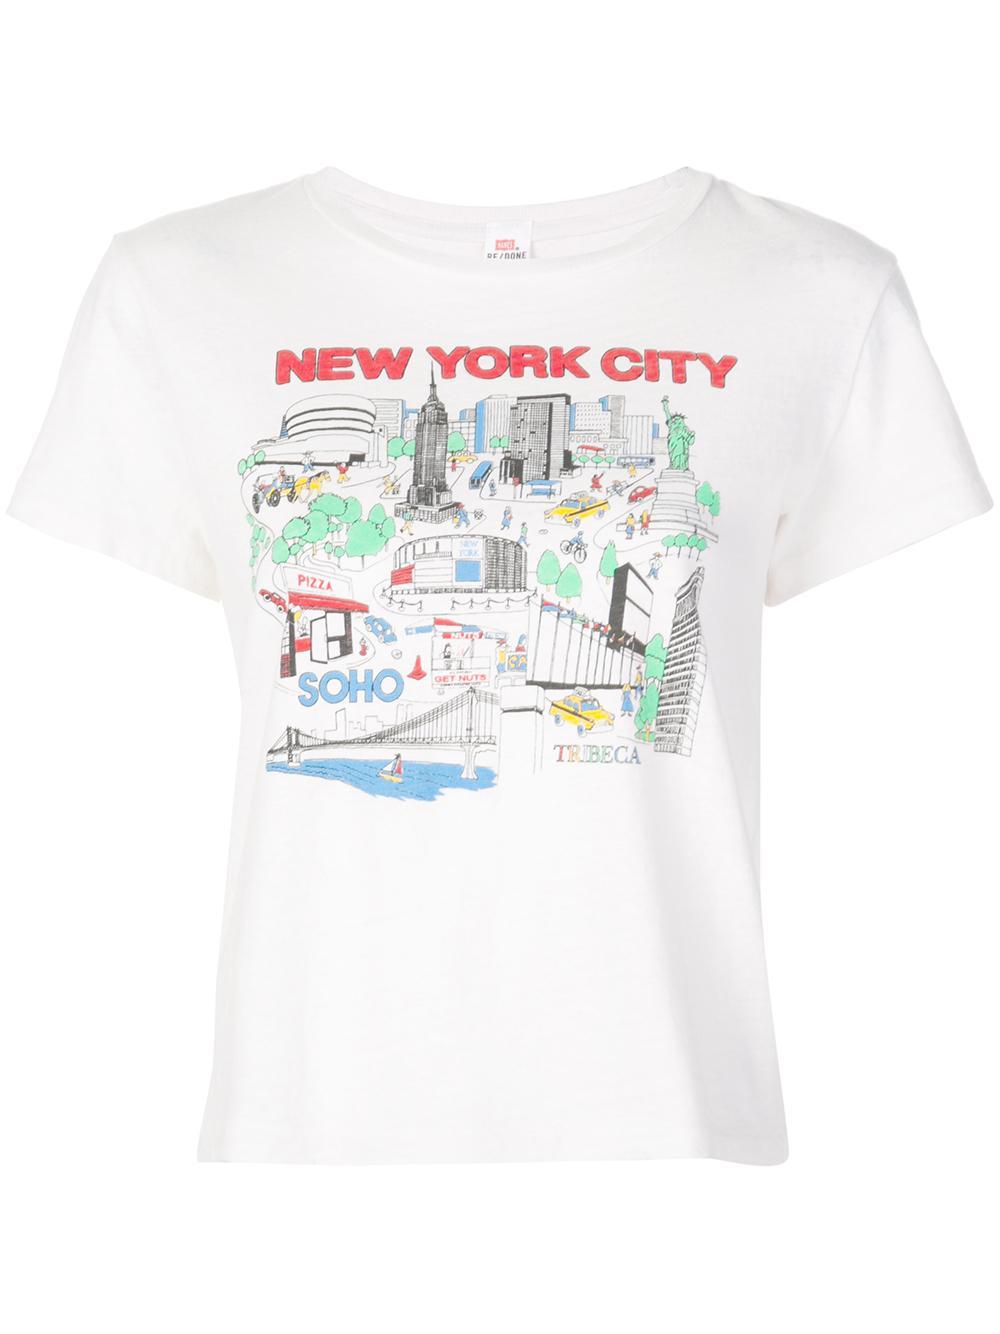 Classic Tee New York City Item # 024-2WCGT96